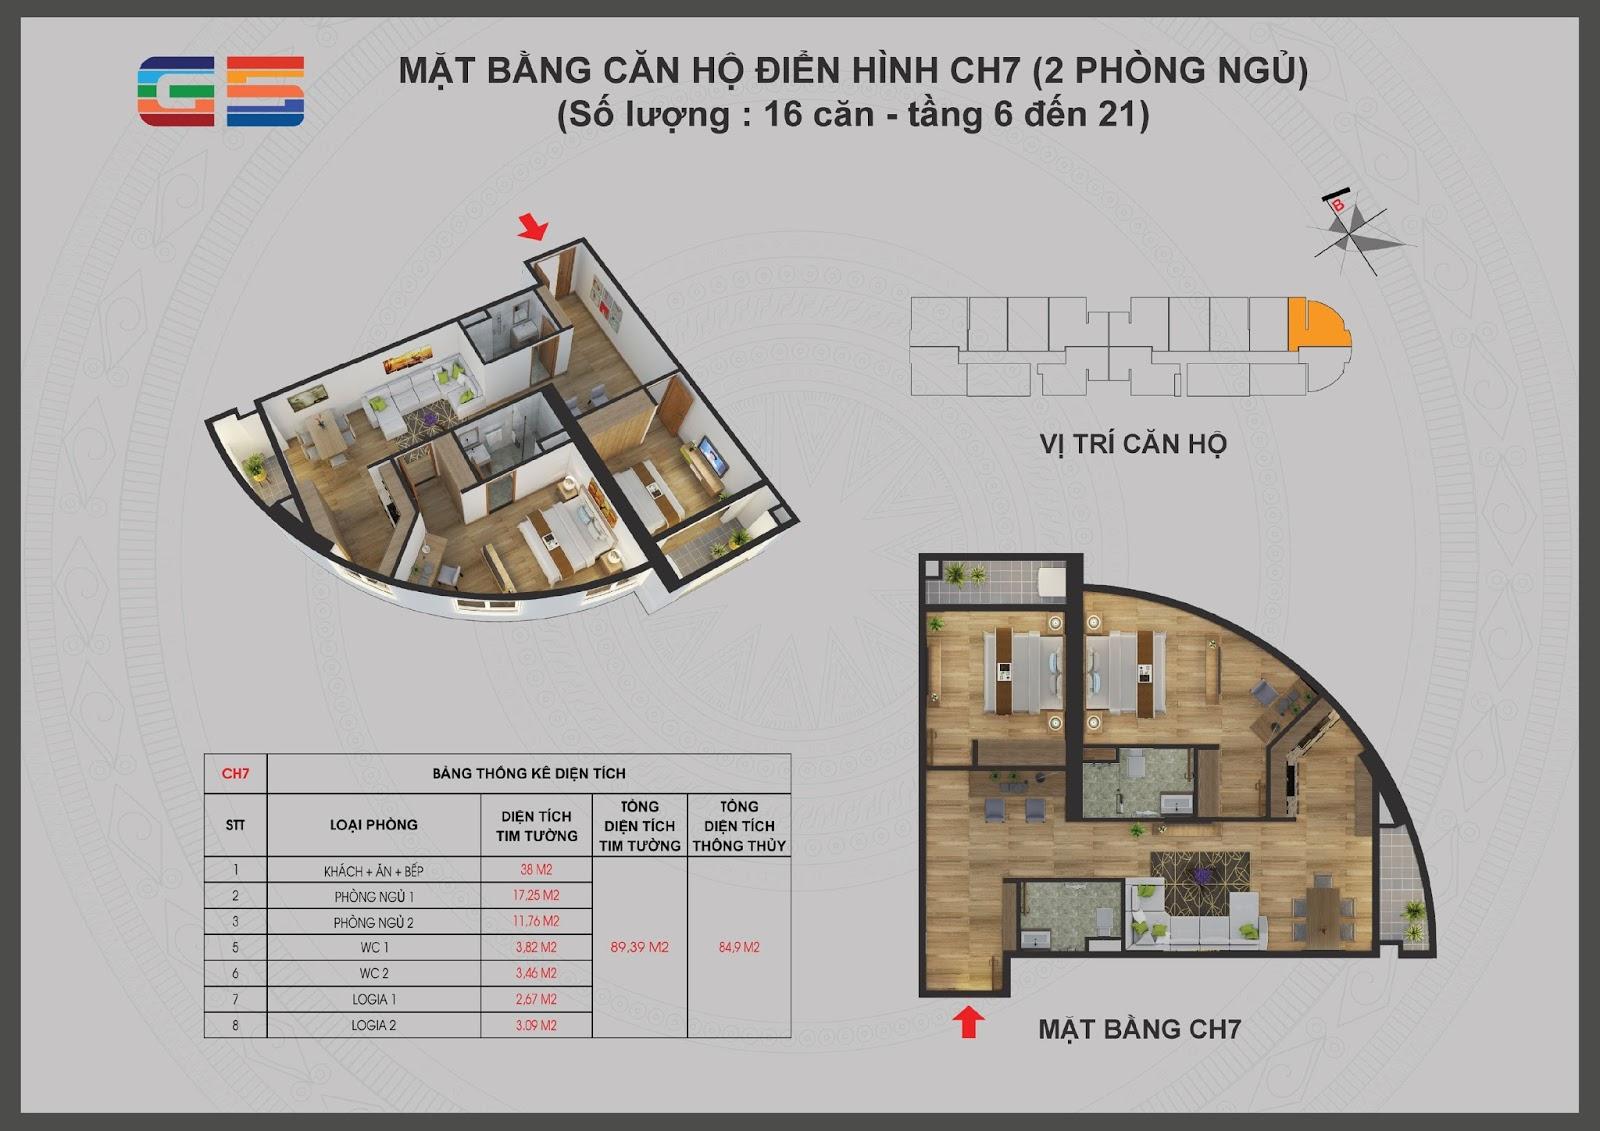 mat-bang-cao-ho-7-tay ho riverview